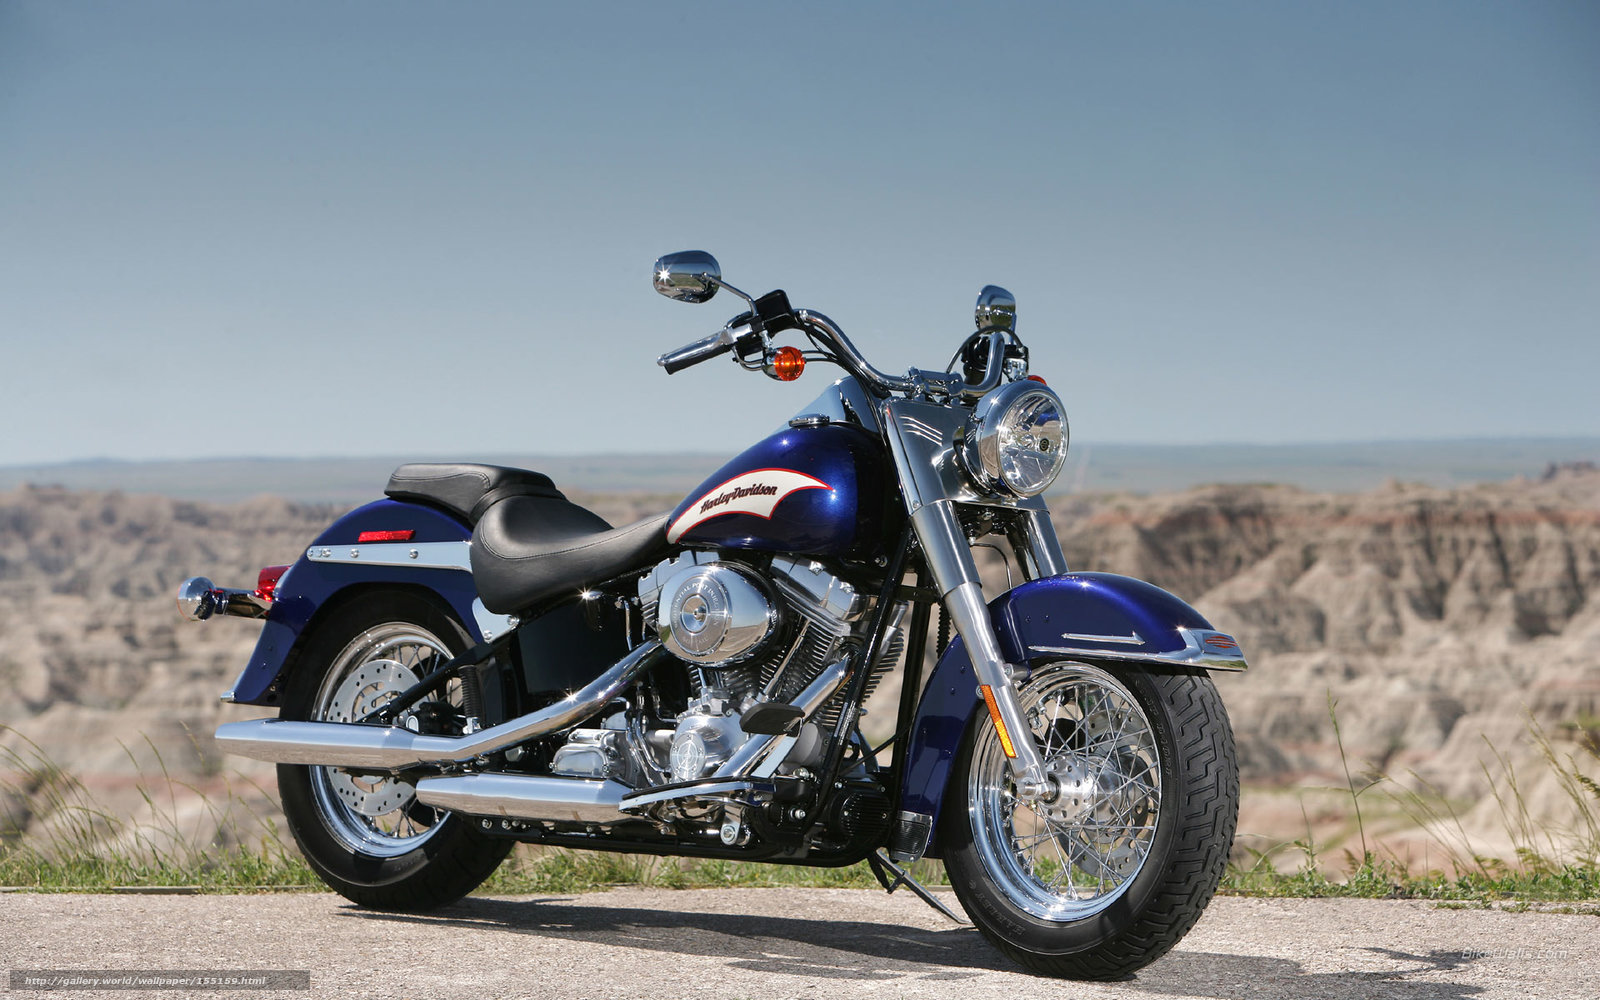 Harley Davidson Desktop Wallpaper Softail - WallpaperSafari